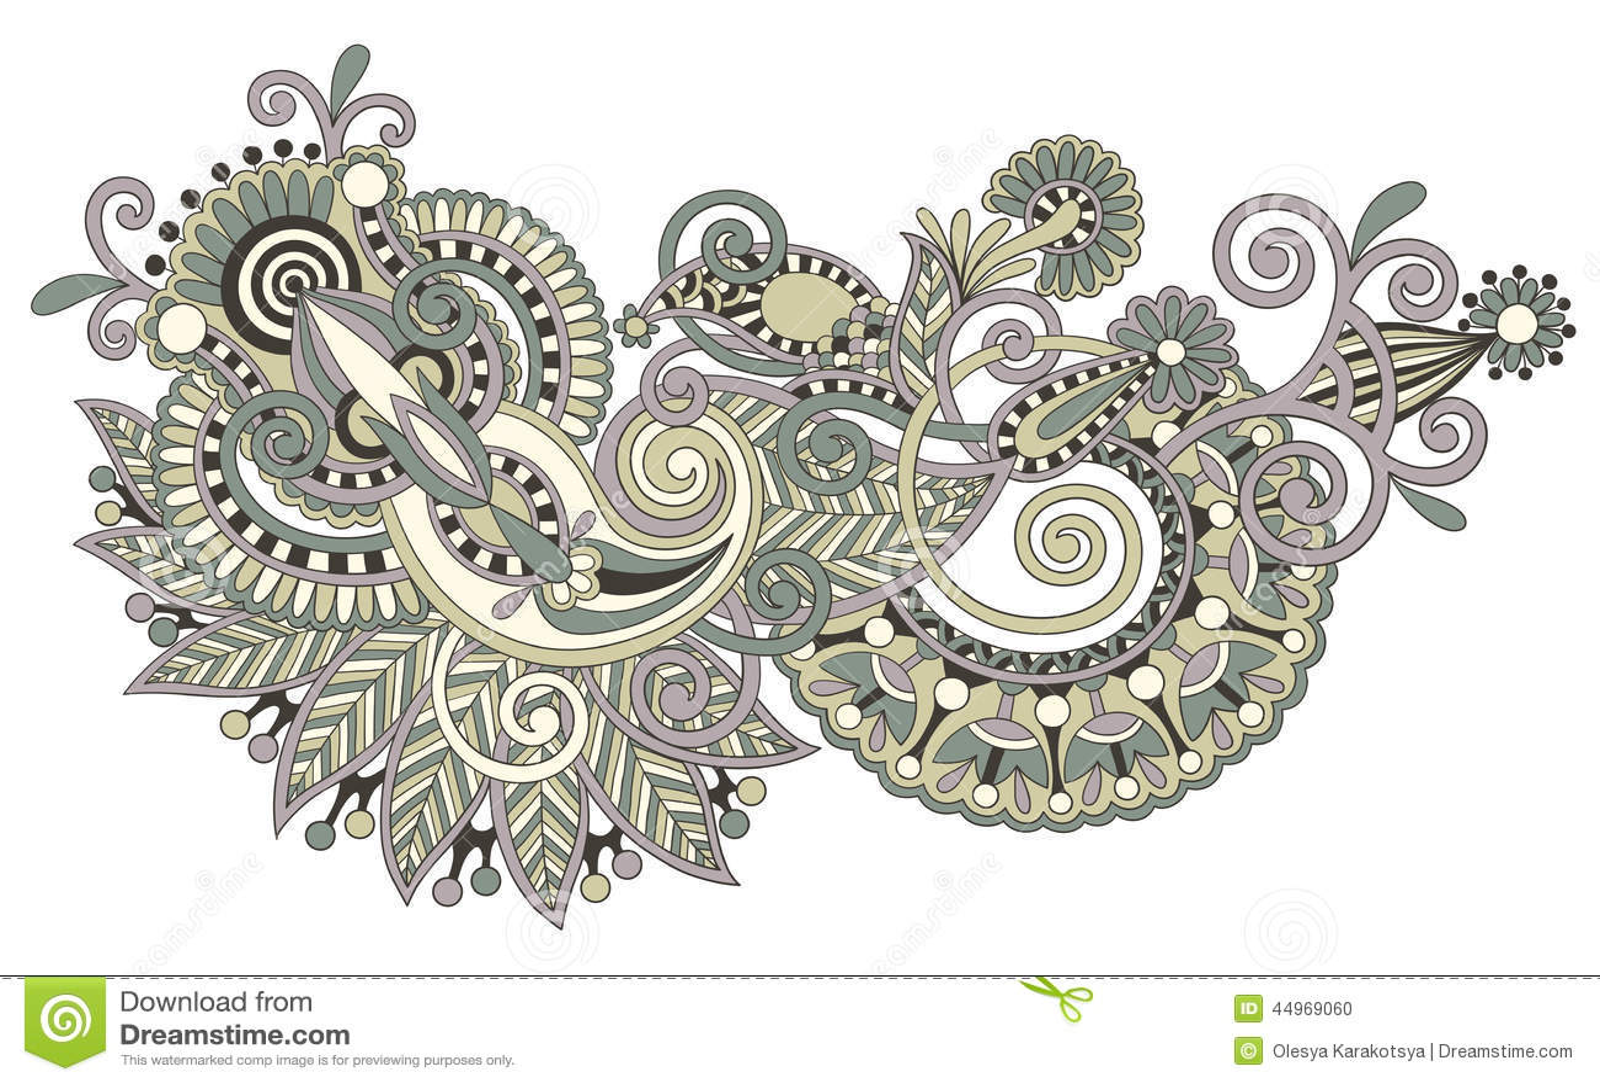 Line Art Ornate Flower Design : Original hand draw line art ornate flower design stock